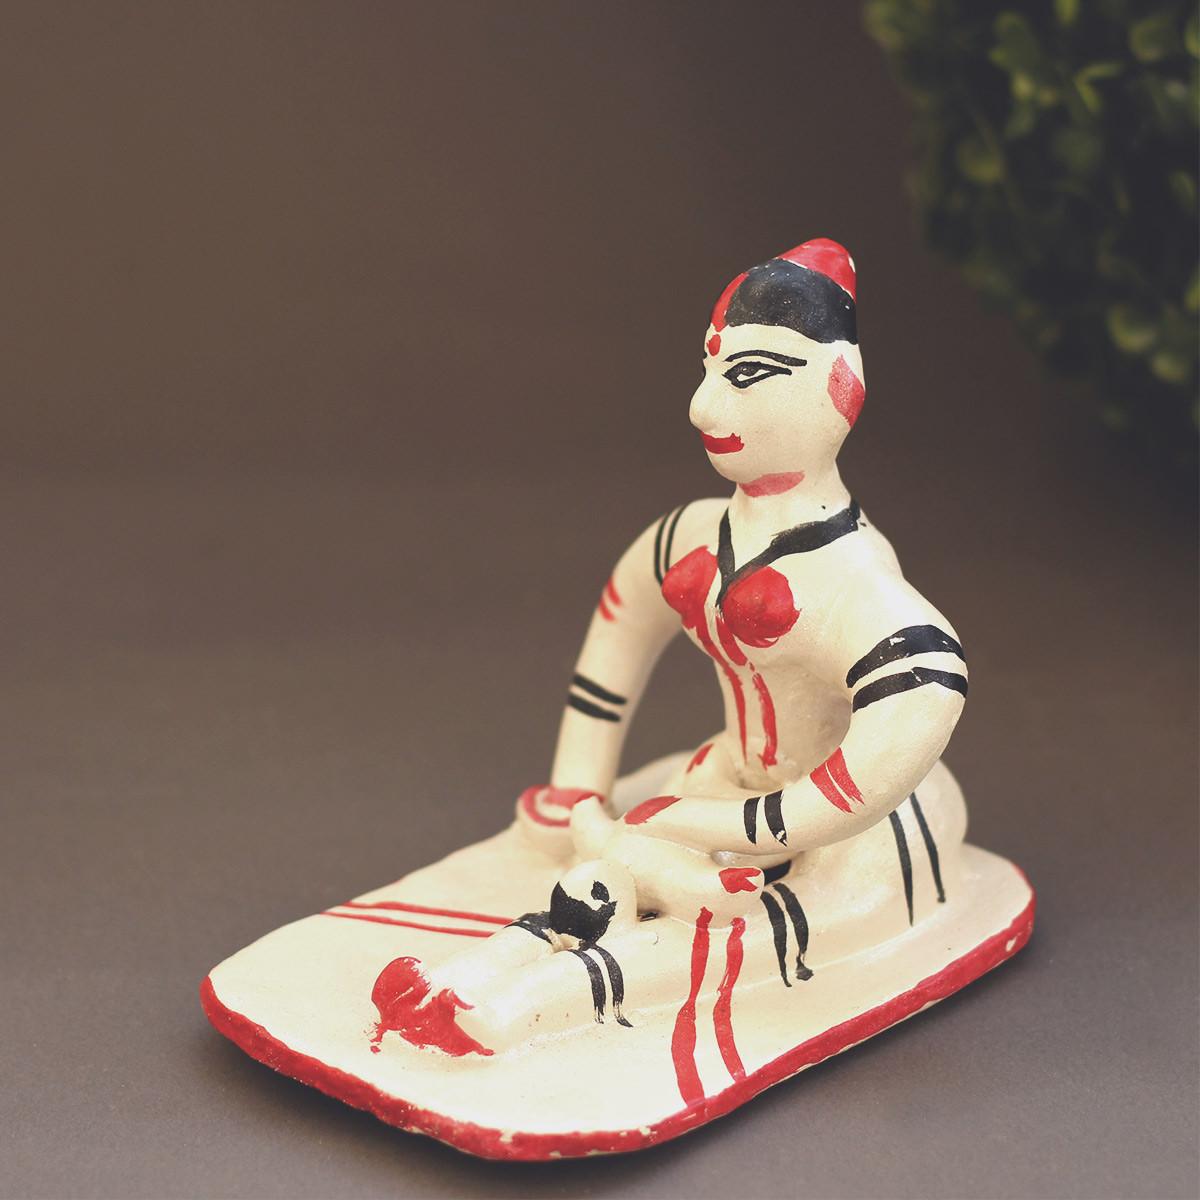 Kanthalia Dolls- A mother's care